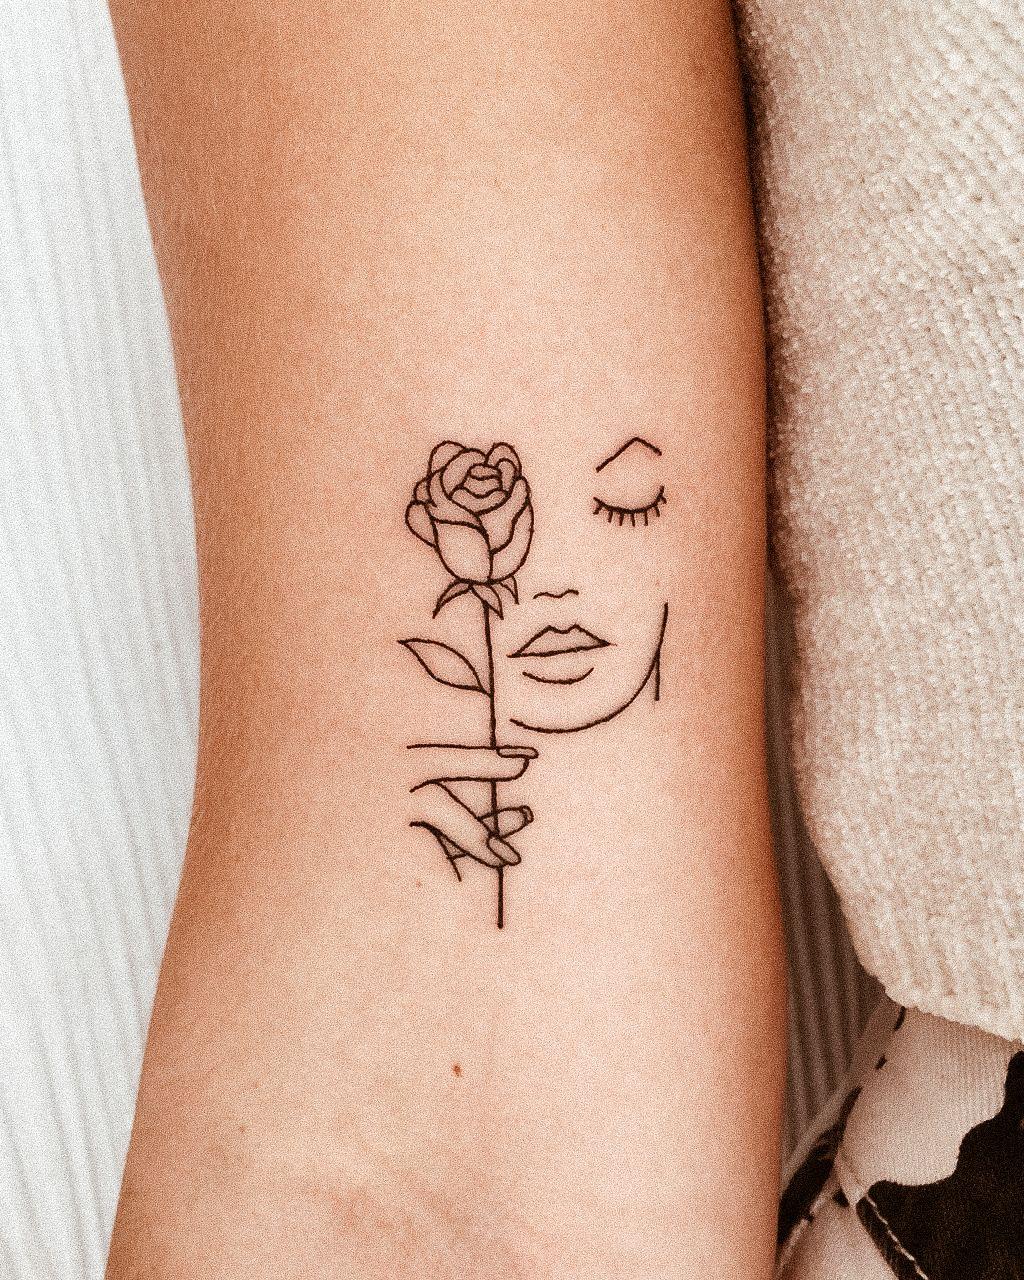 Fine Line Face Small Face Tattoos Dainty Tattoos Line Tattoos